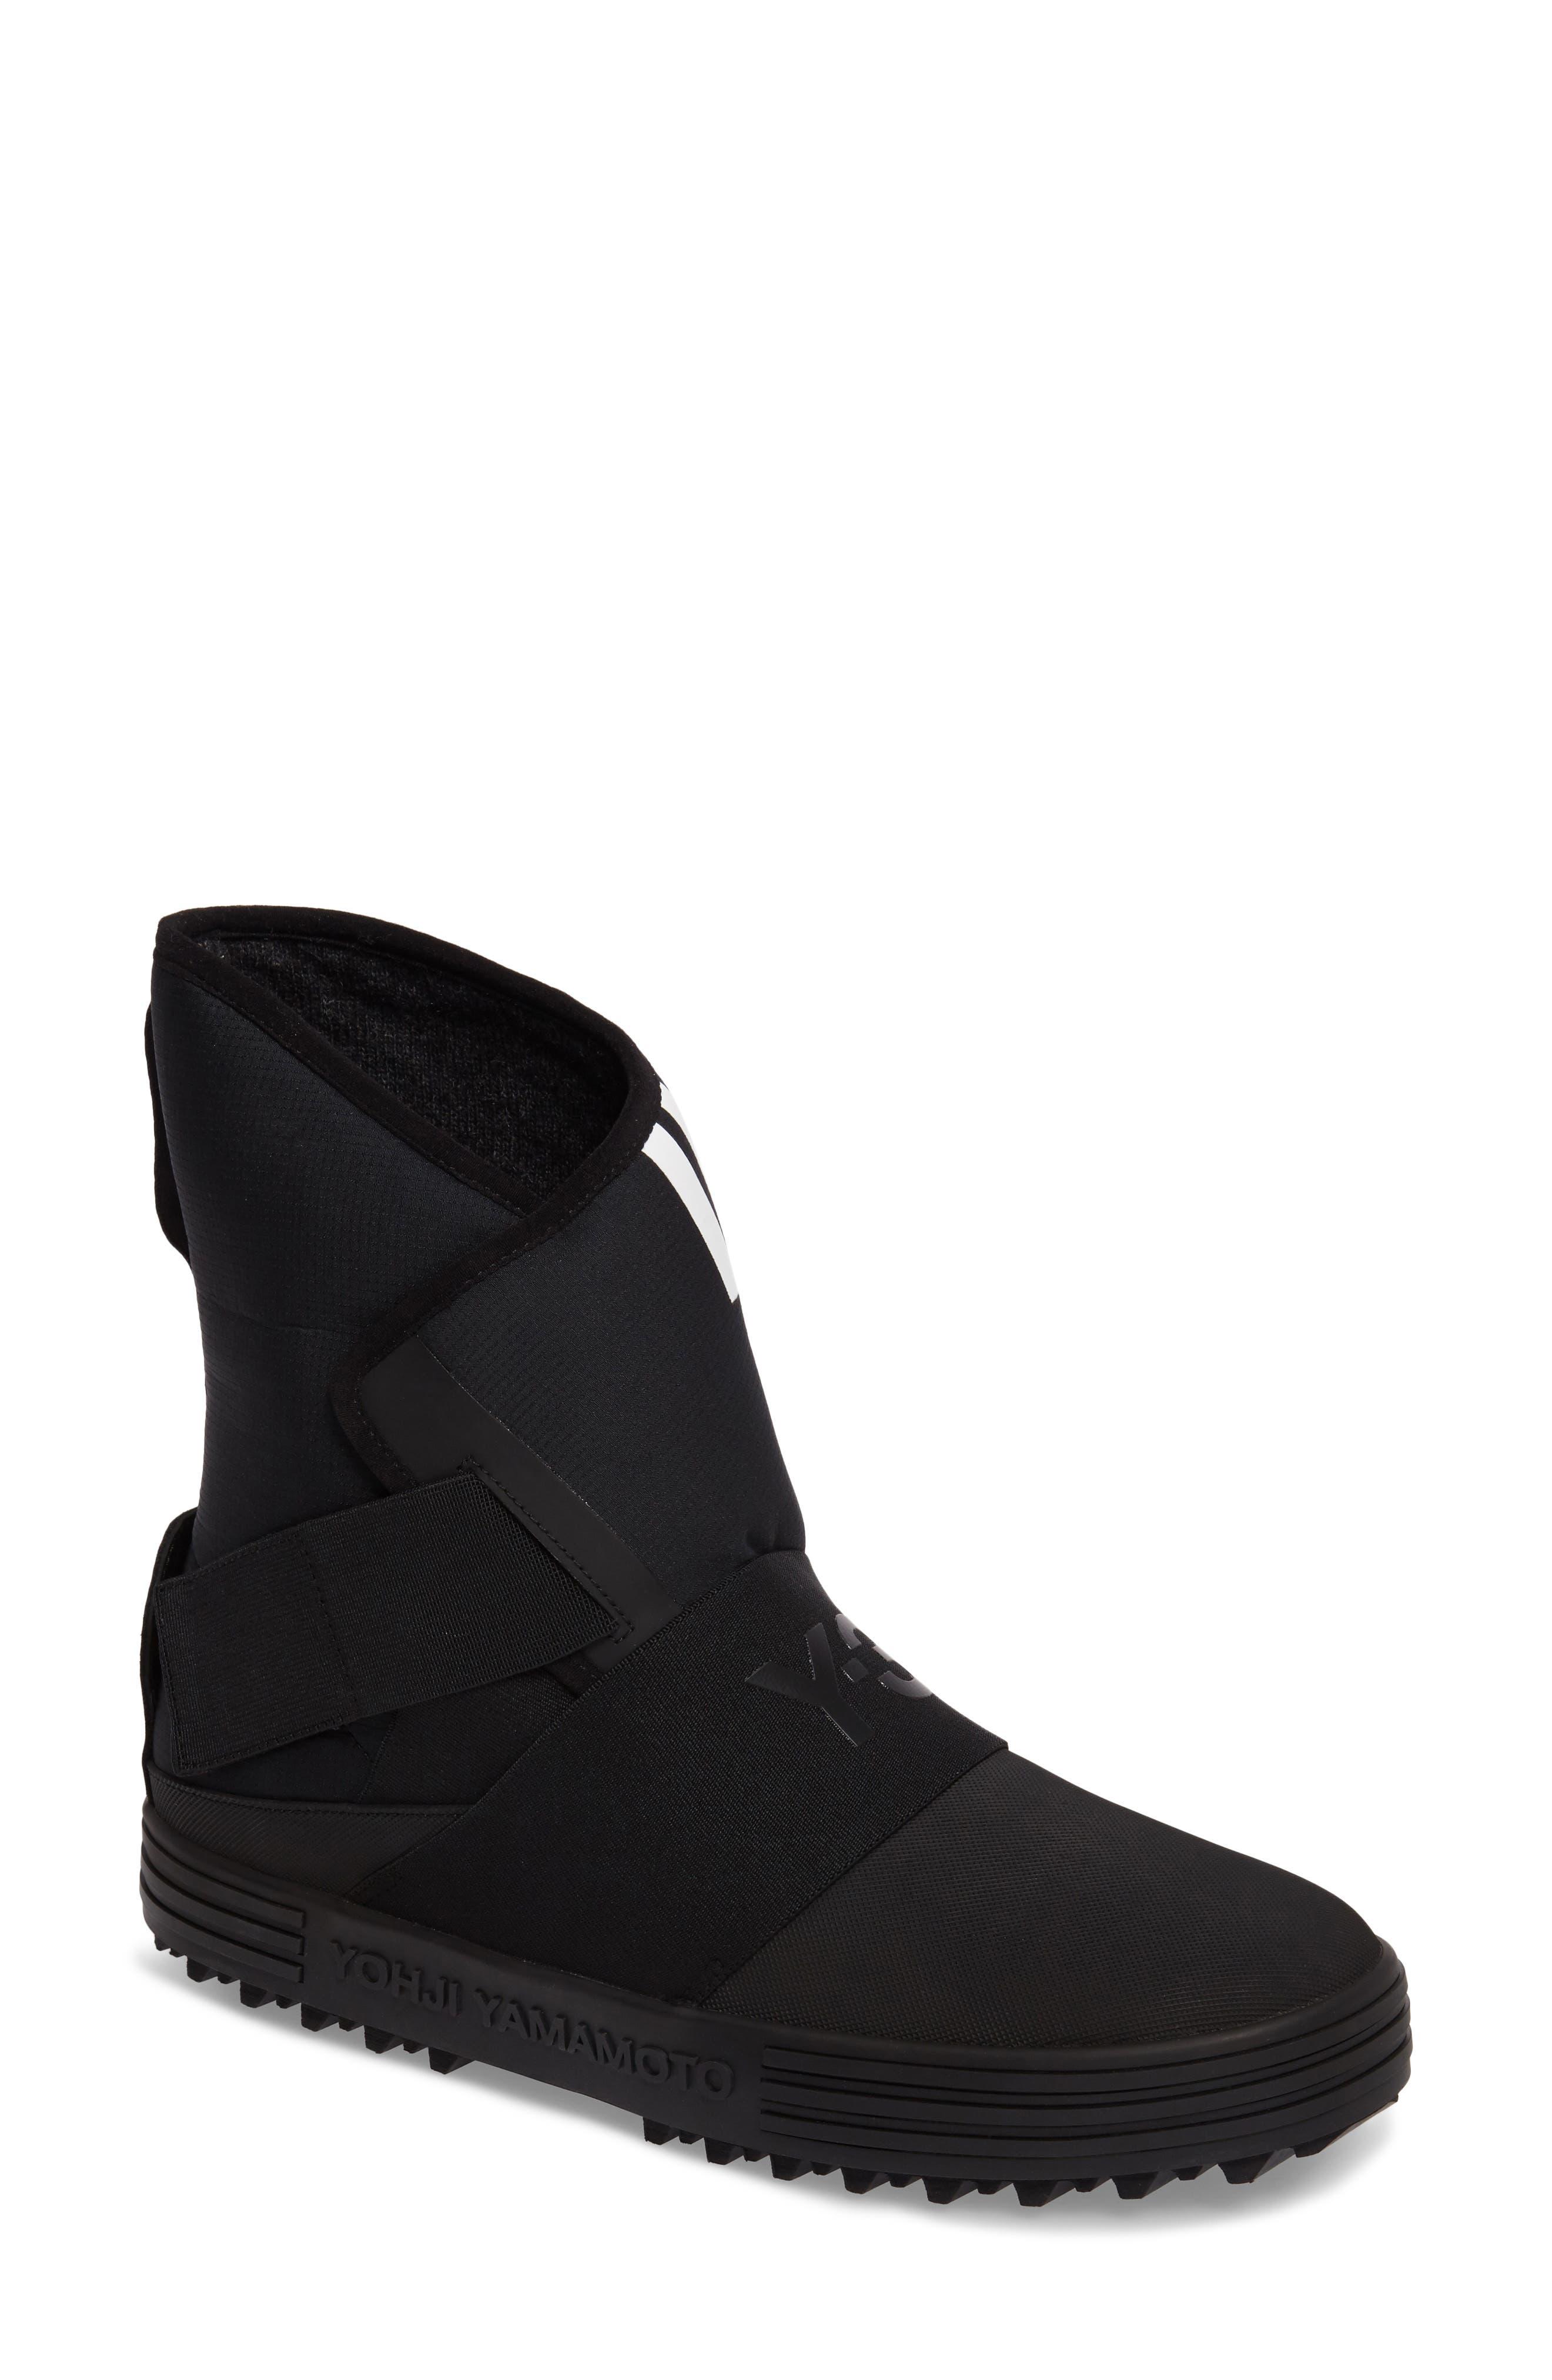 Sno Foxing High Top Sneaker,                             Main thumbnail 1, color,                             001